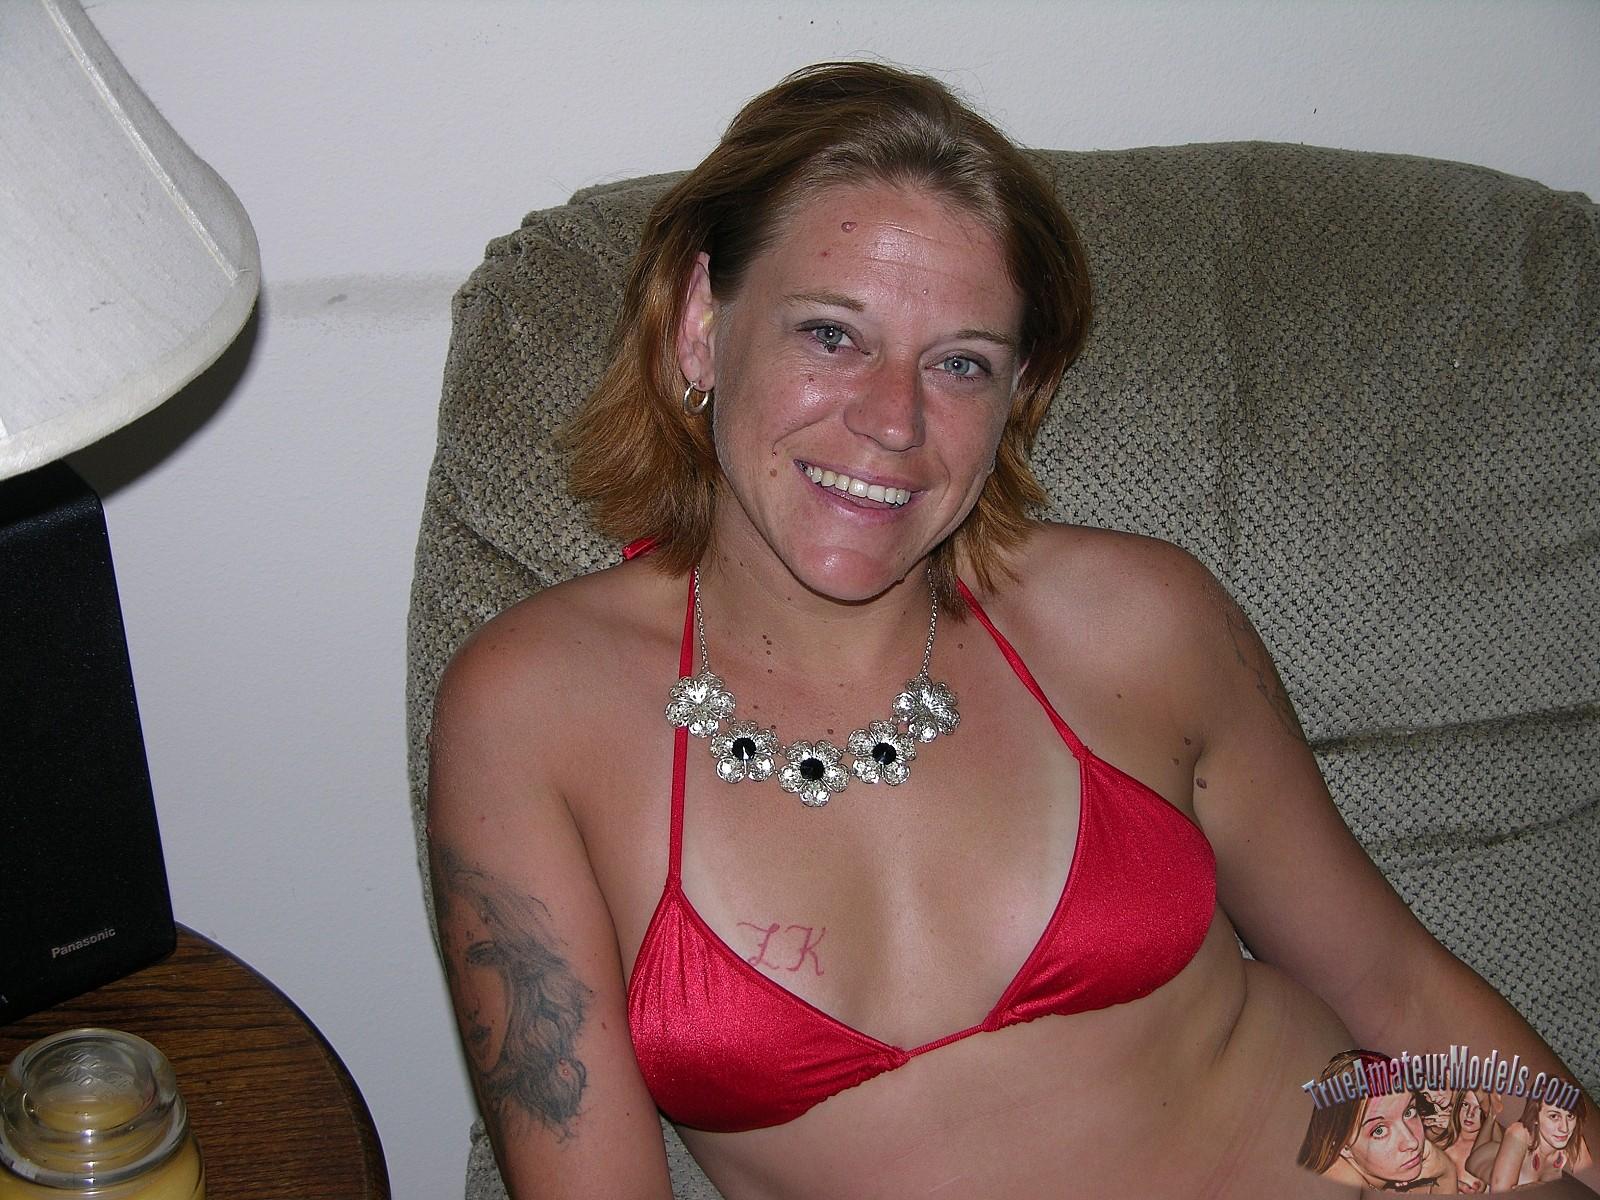 true amateur models valadara trailer park soccer mom strips bikini